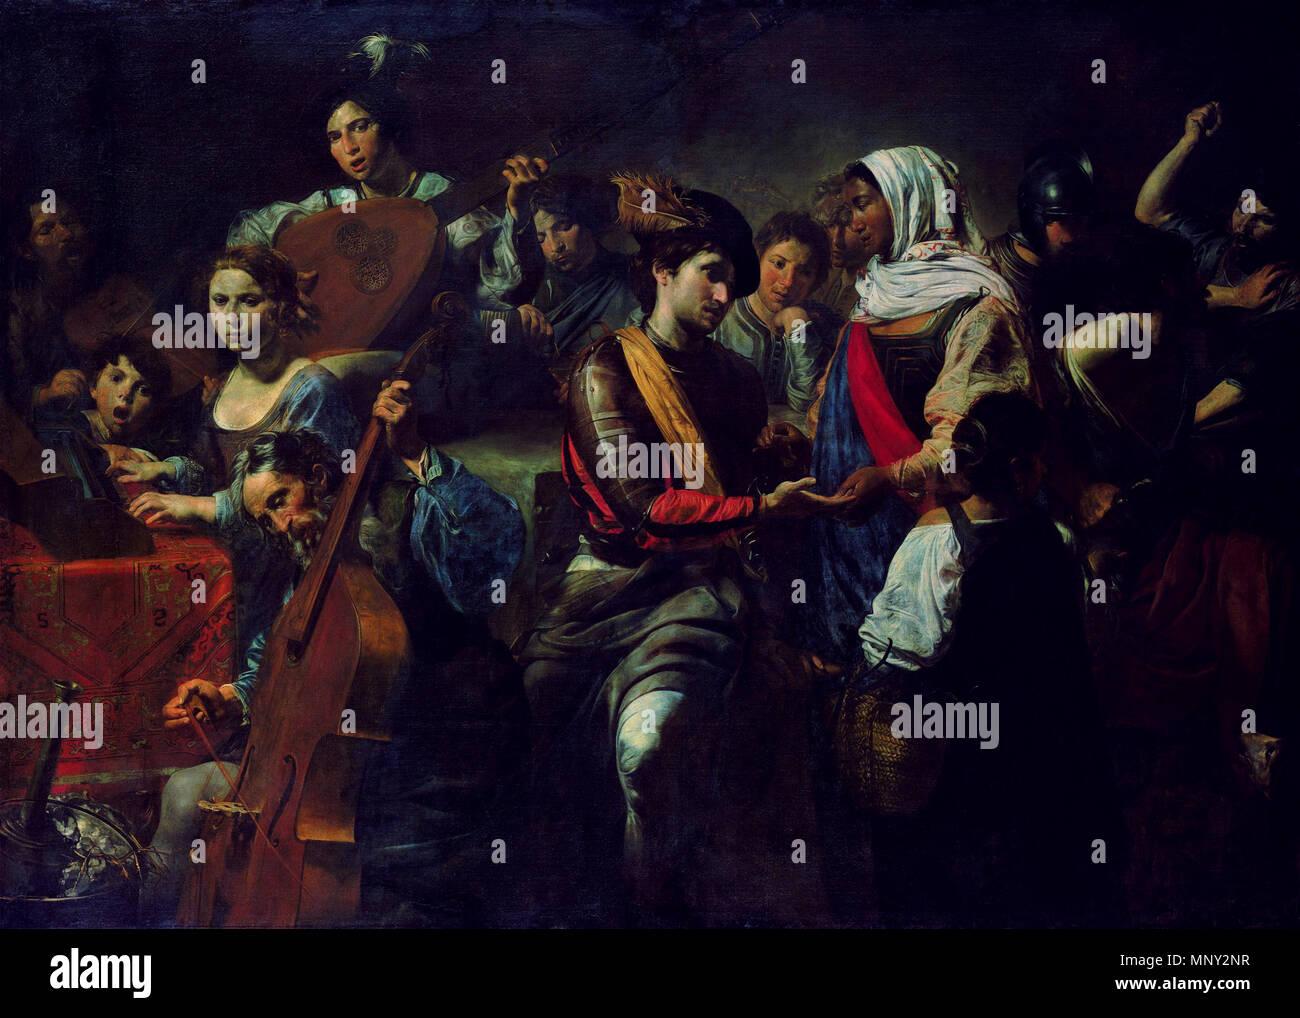 . Italiano: La Buona ventura . 17th century. Valentin de Boulogne - Vienna, Liechtenstein Museum 1218 Valentin de Boulogne - La Buona ventura - Stock Image